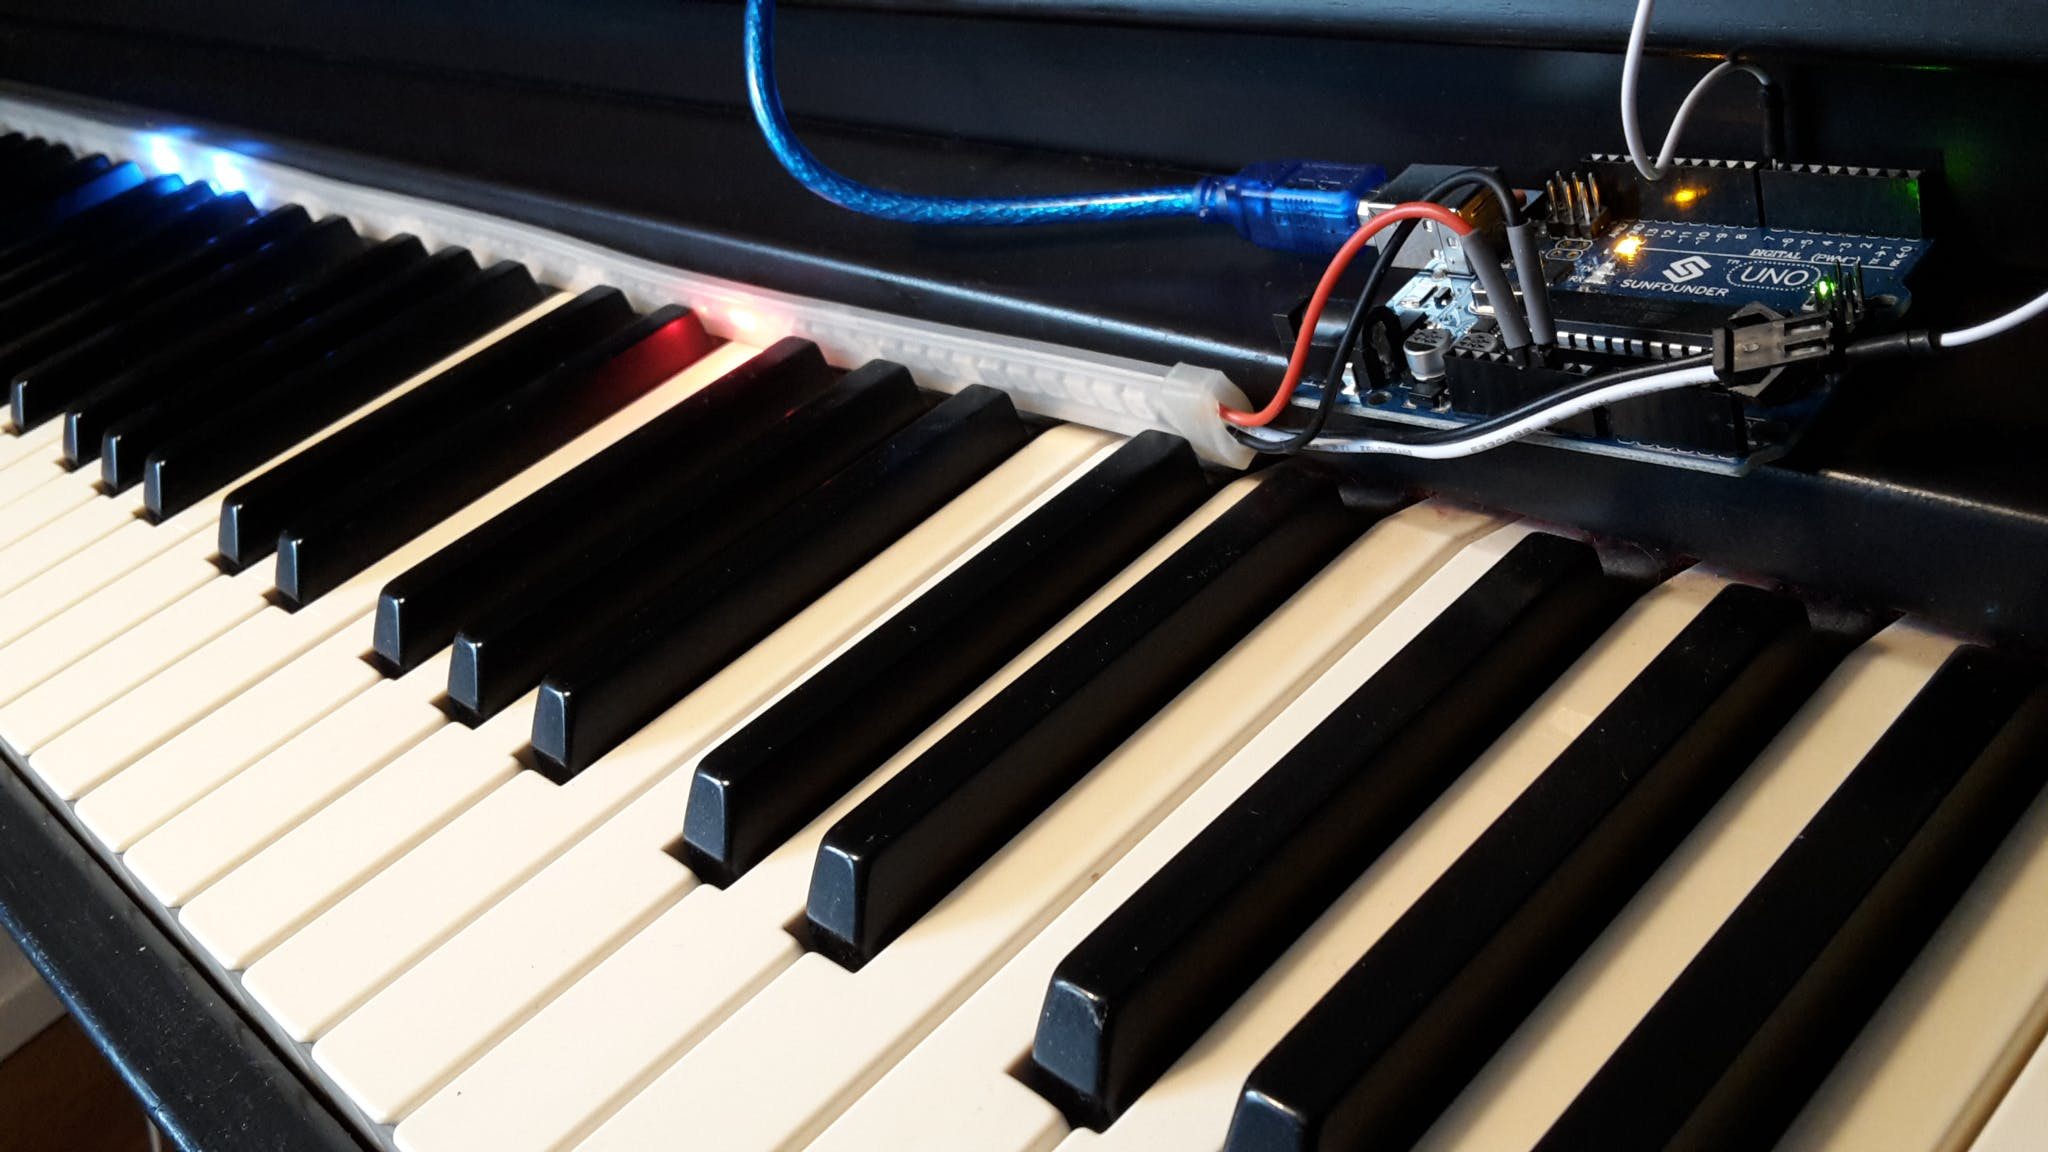 Arduino + LEDs + MIDI Keyboard + MuseScore = Piano Tutor